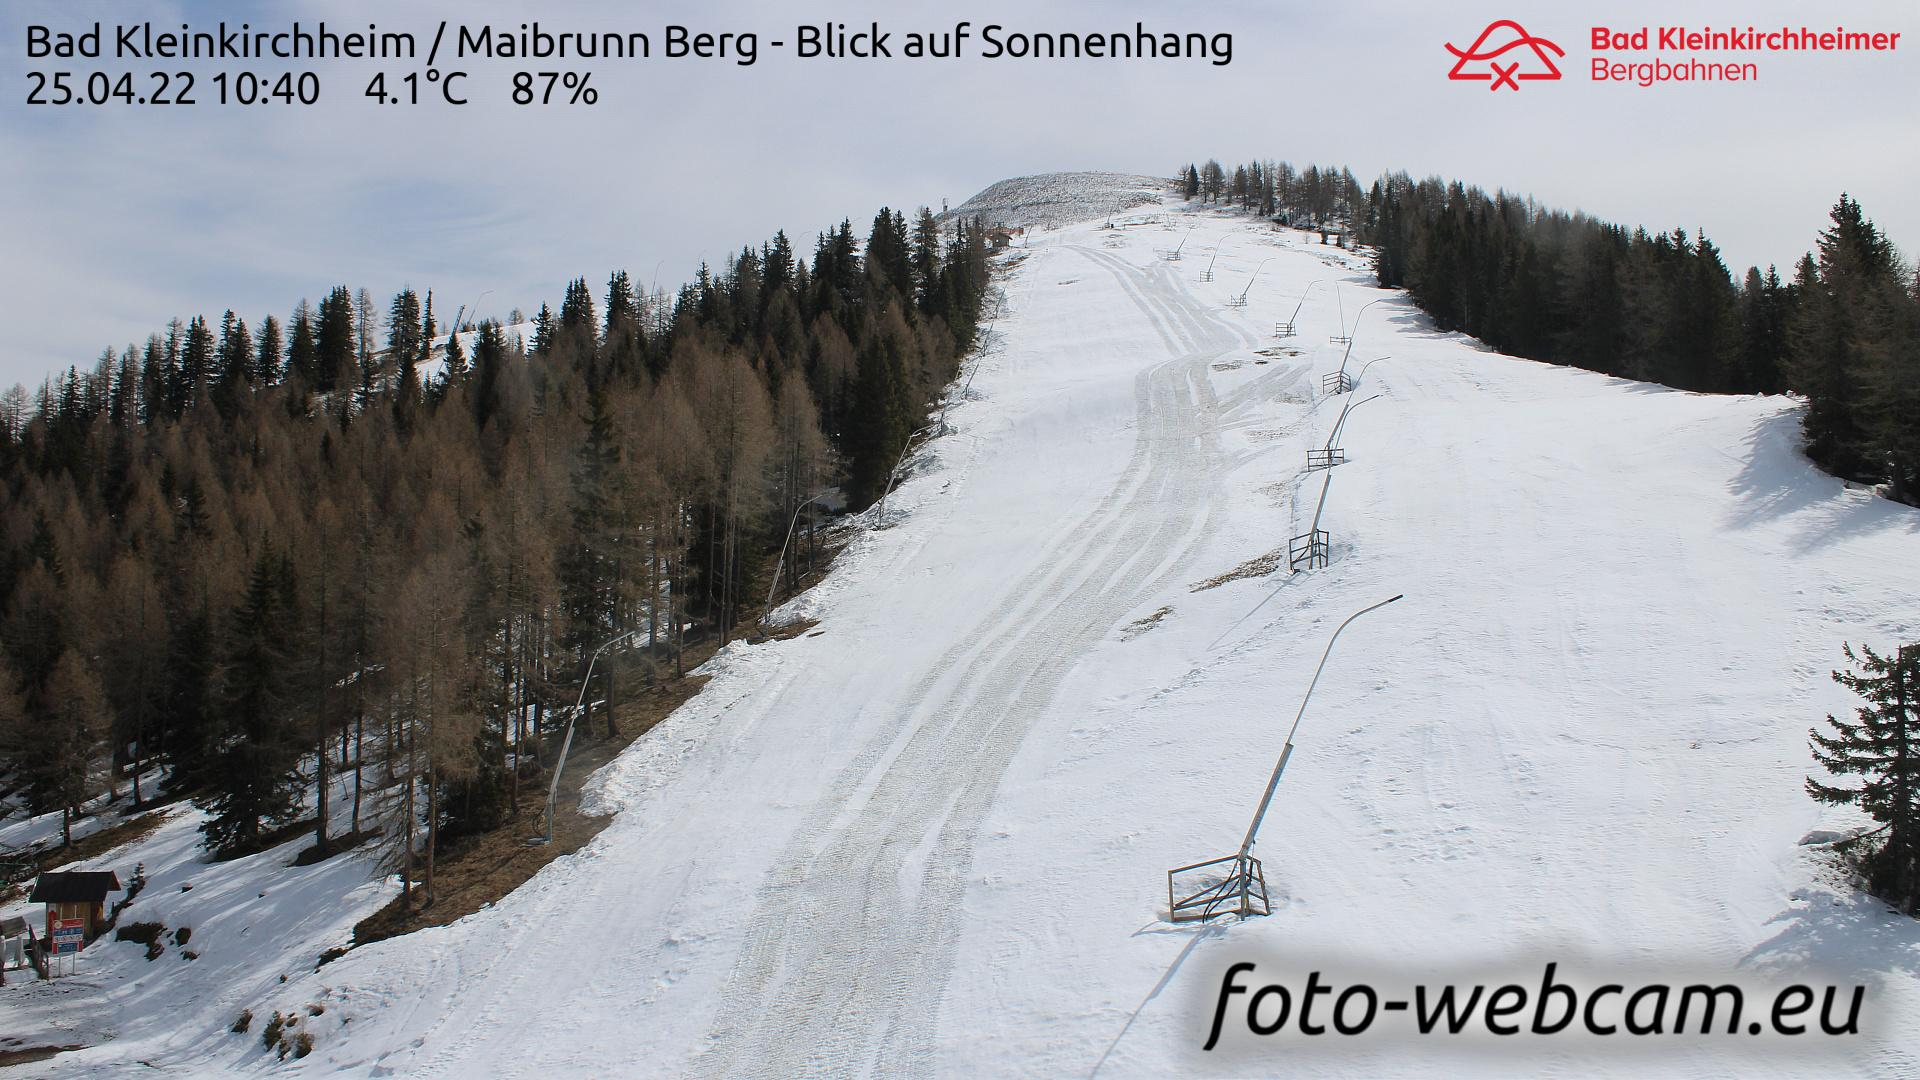 Webcam Rauth: Bad Kleinkirchheim − Maibrunn Berg − Blick